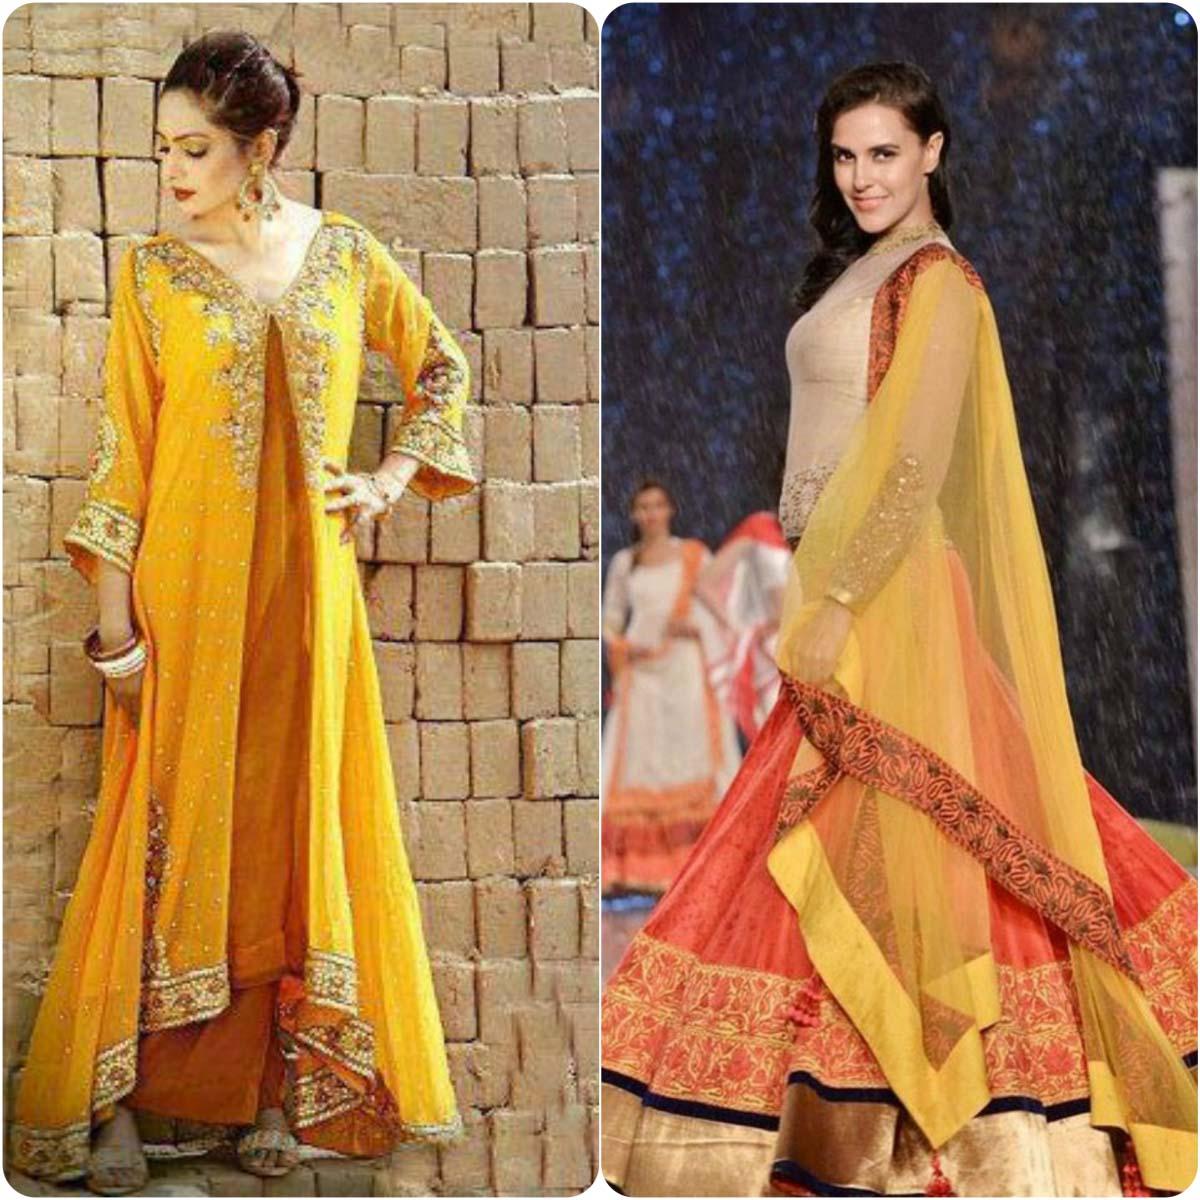 Beautiful Yellow Mehndi Dresses for Wedding Brides 2016-2017 (4)